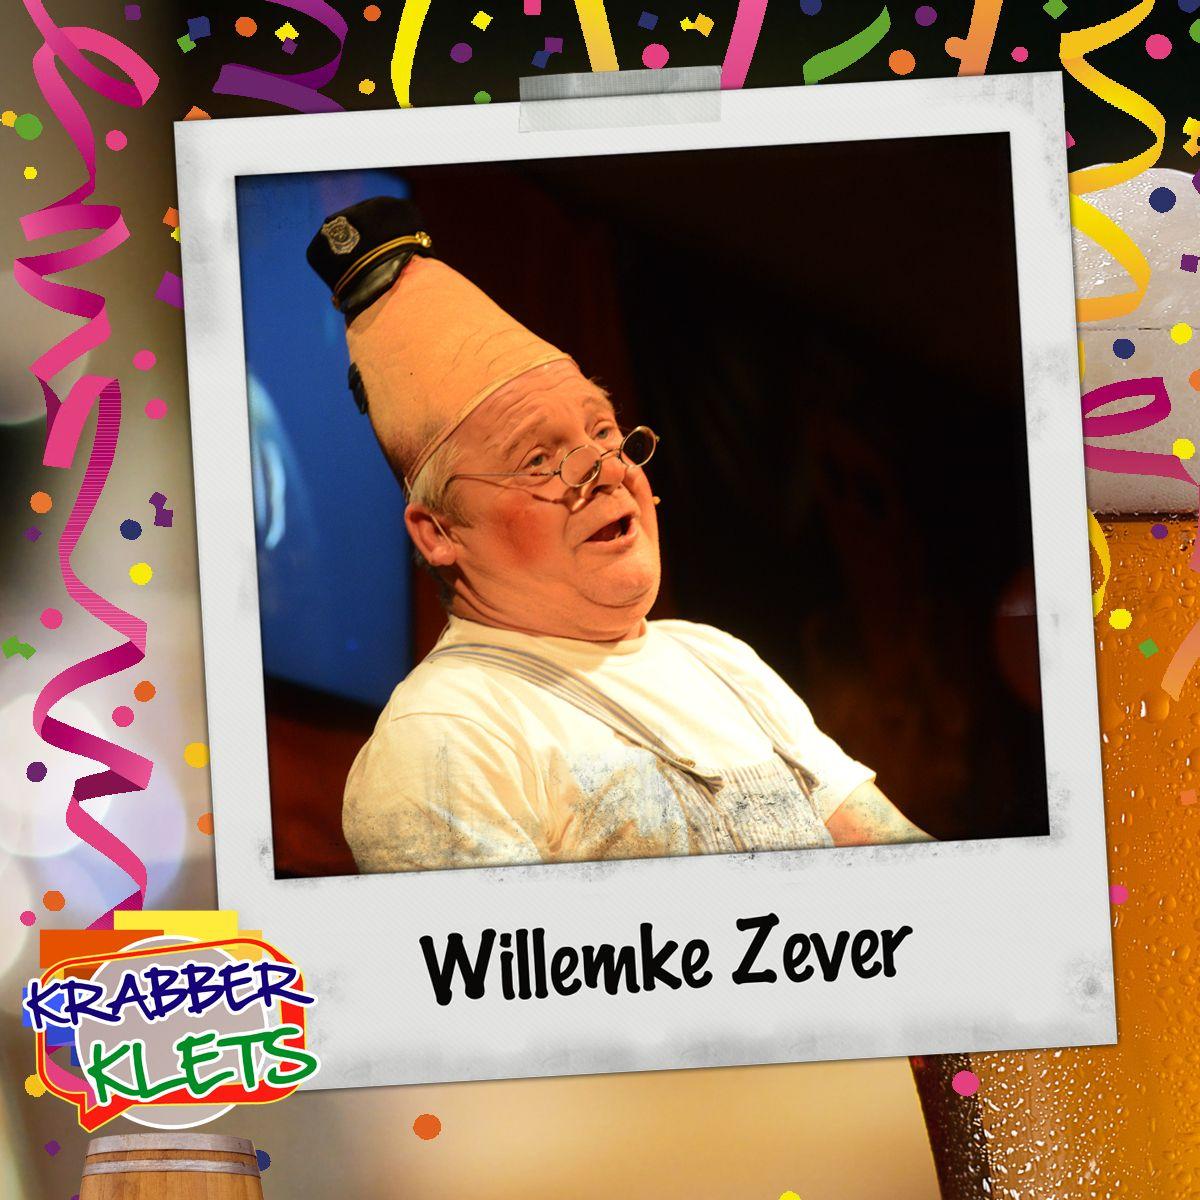 Willem Verhoeven: Willemke Zever, https://www.facebook.com/krabberklets/?fref=ts